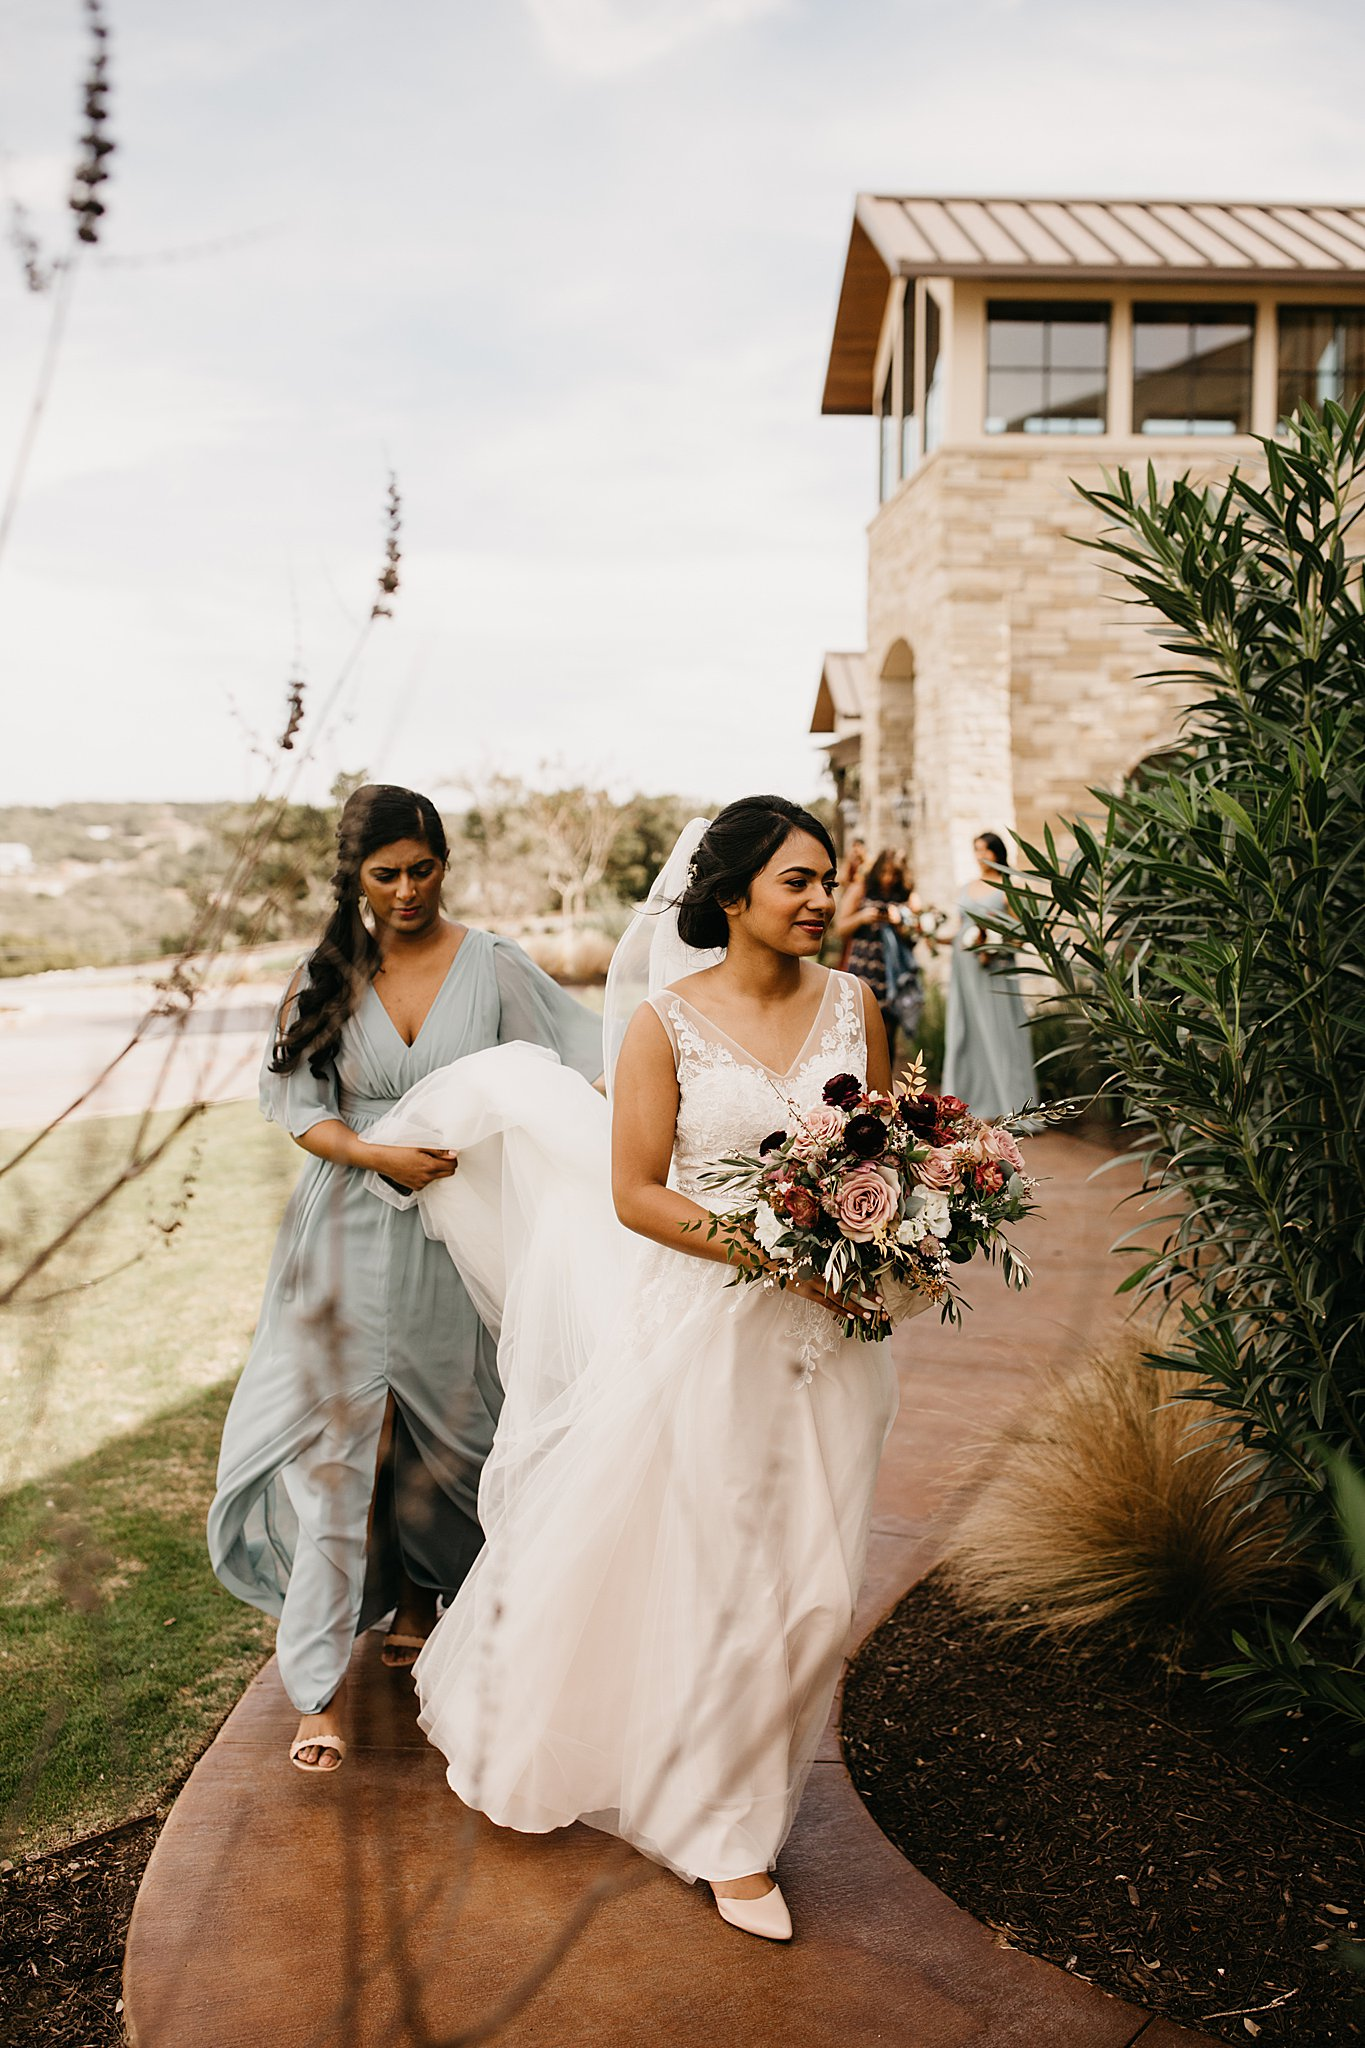 Wilderlove Co_Dripping Springs Texas_Texas Hill Country Wedding_Photography_0028.jpg